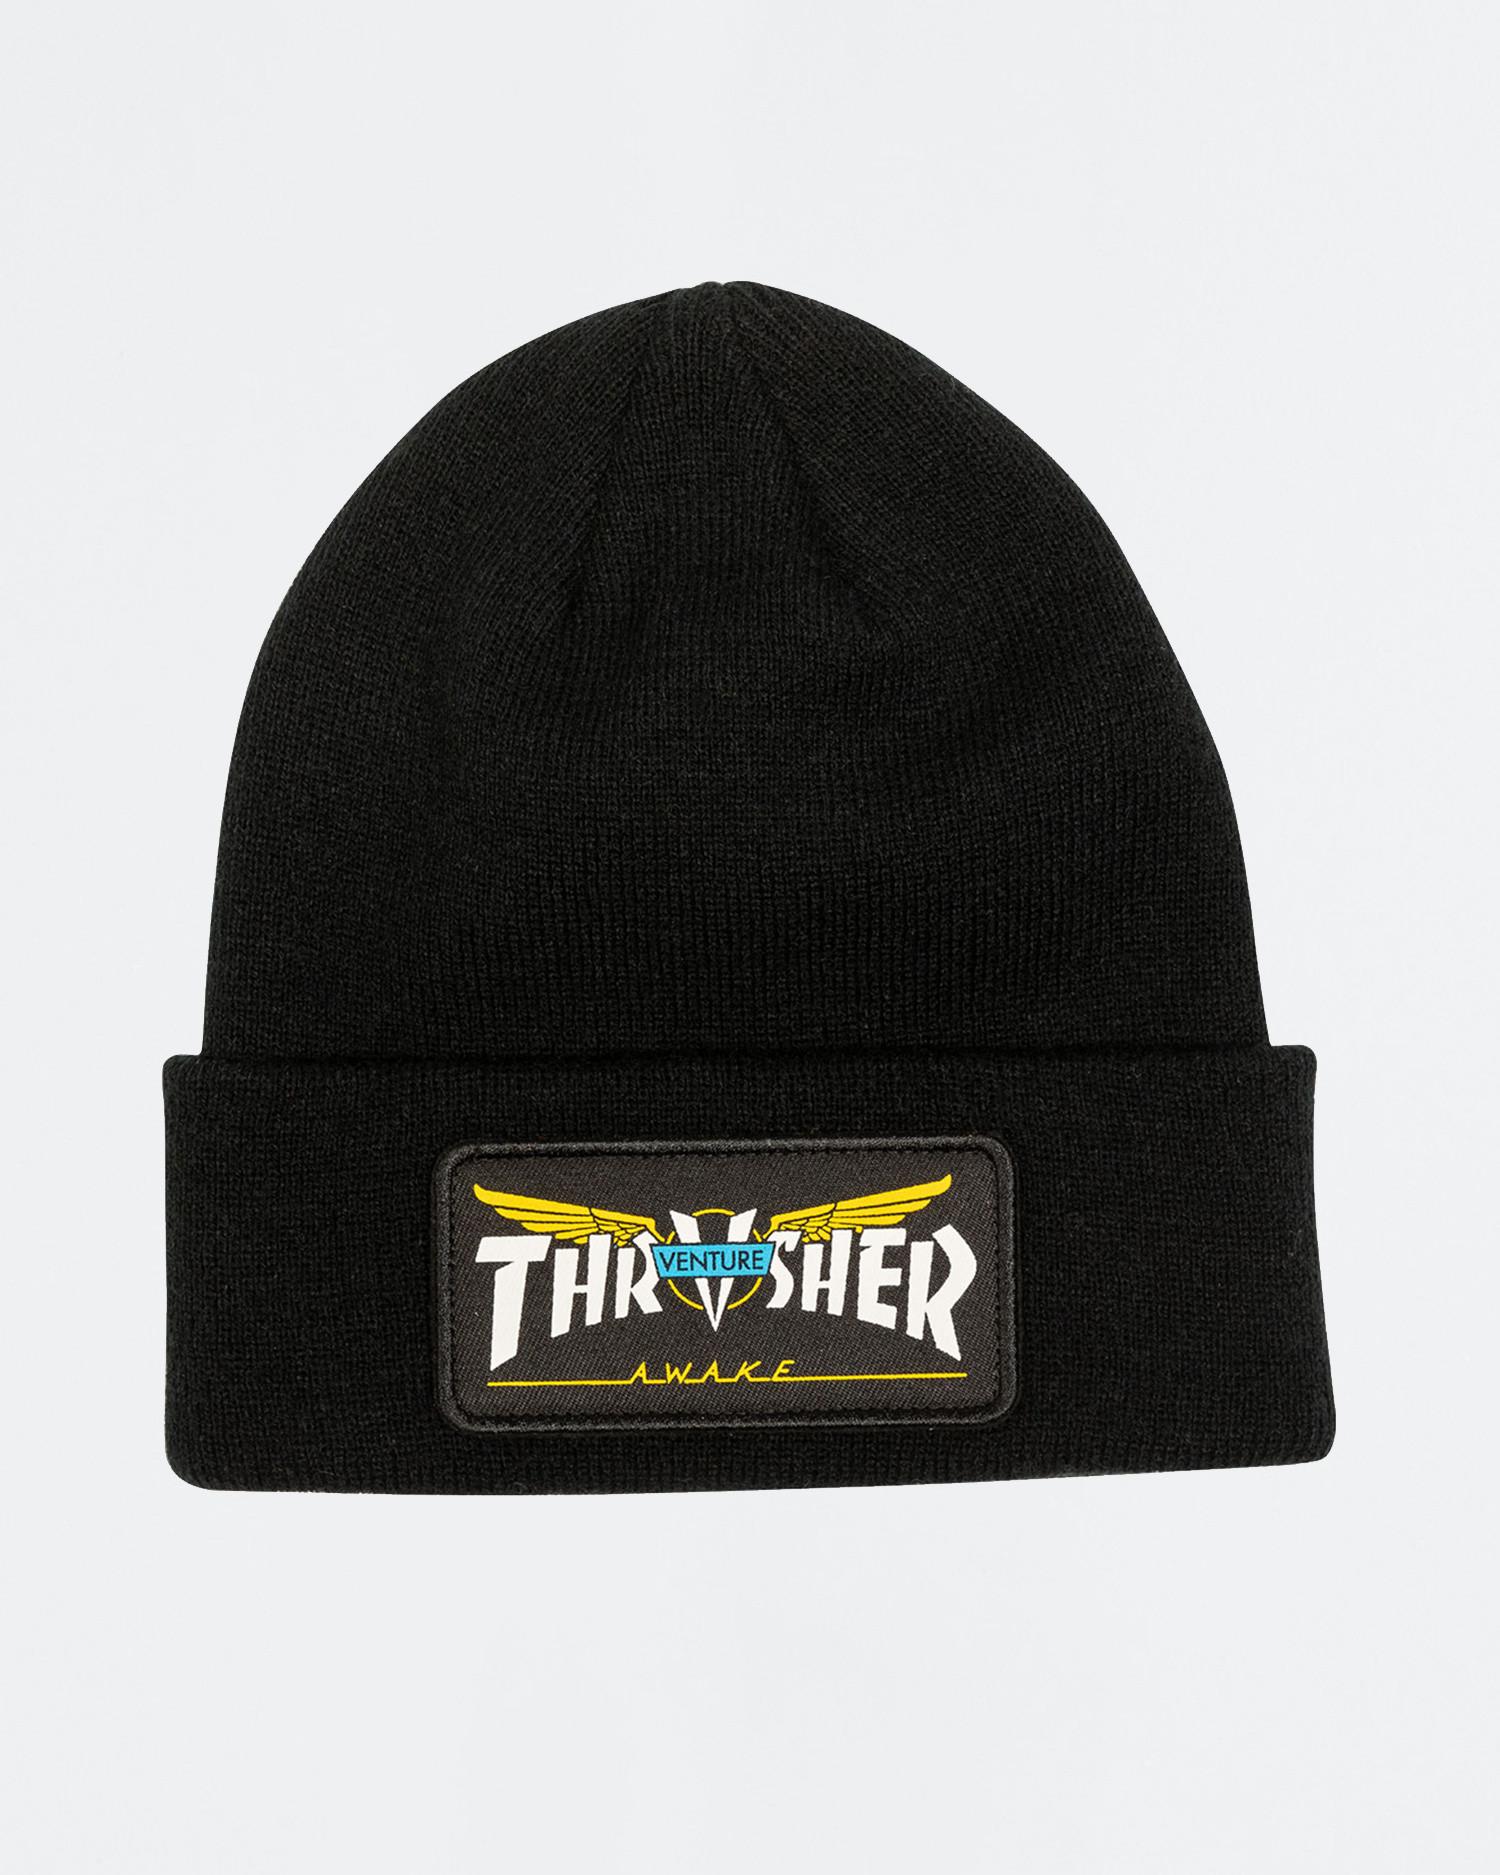 Thrasher Venture Collab Patch Beanie Black